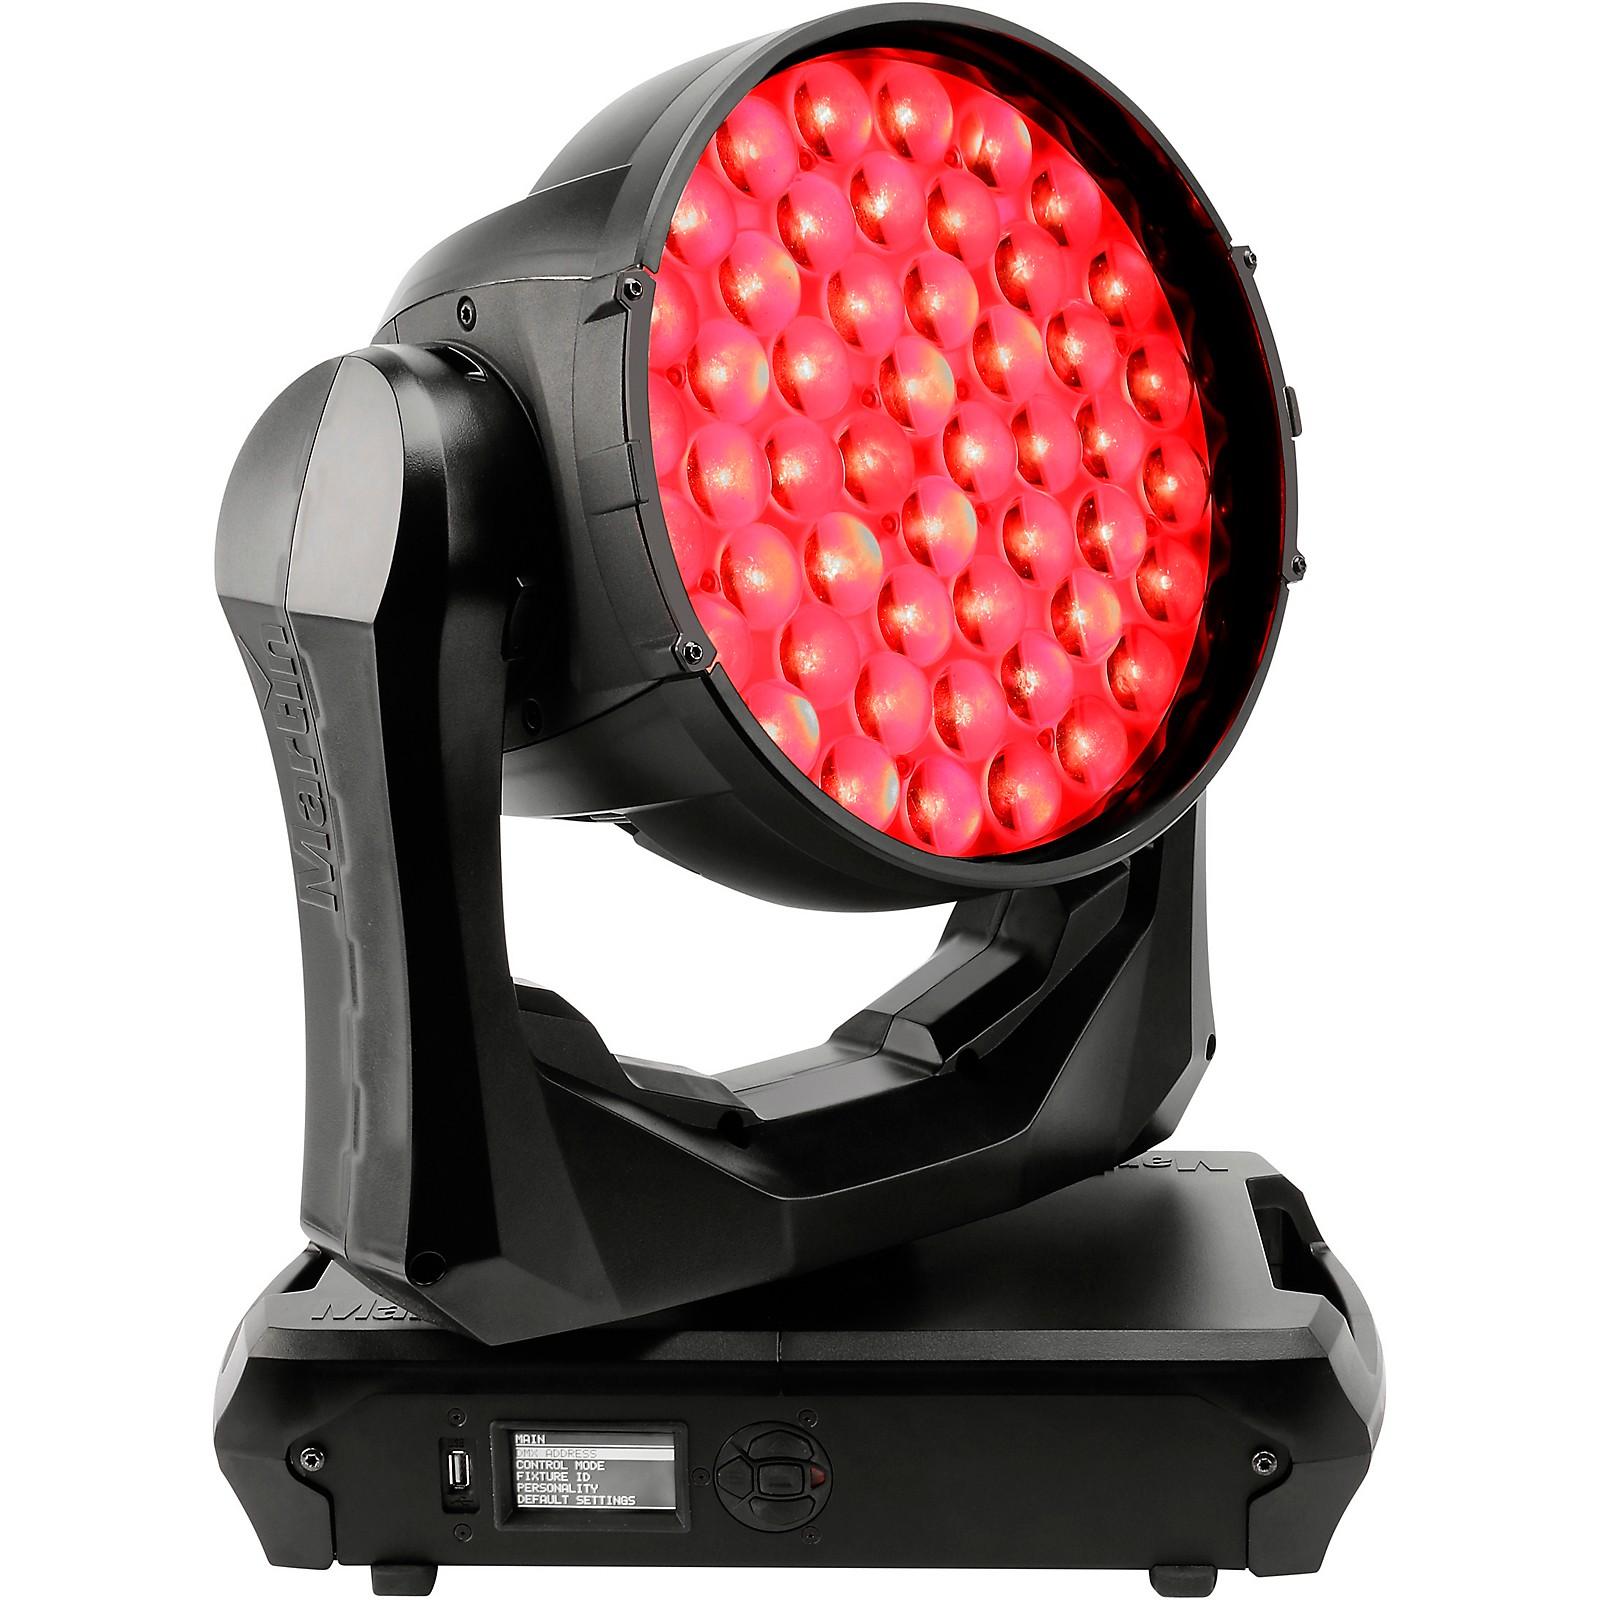 Martin Professional MAC Quantum Wash RGBW LED Moving Head Light